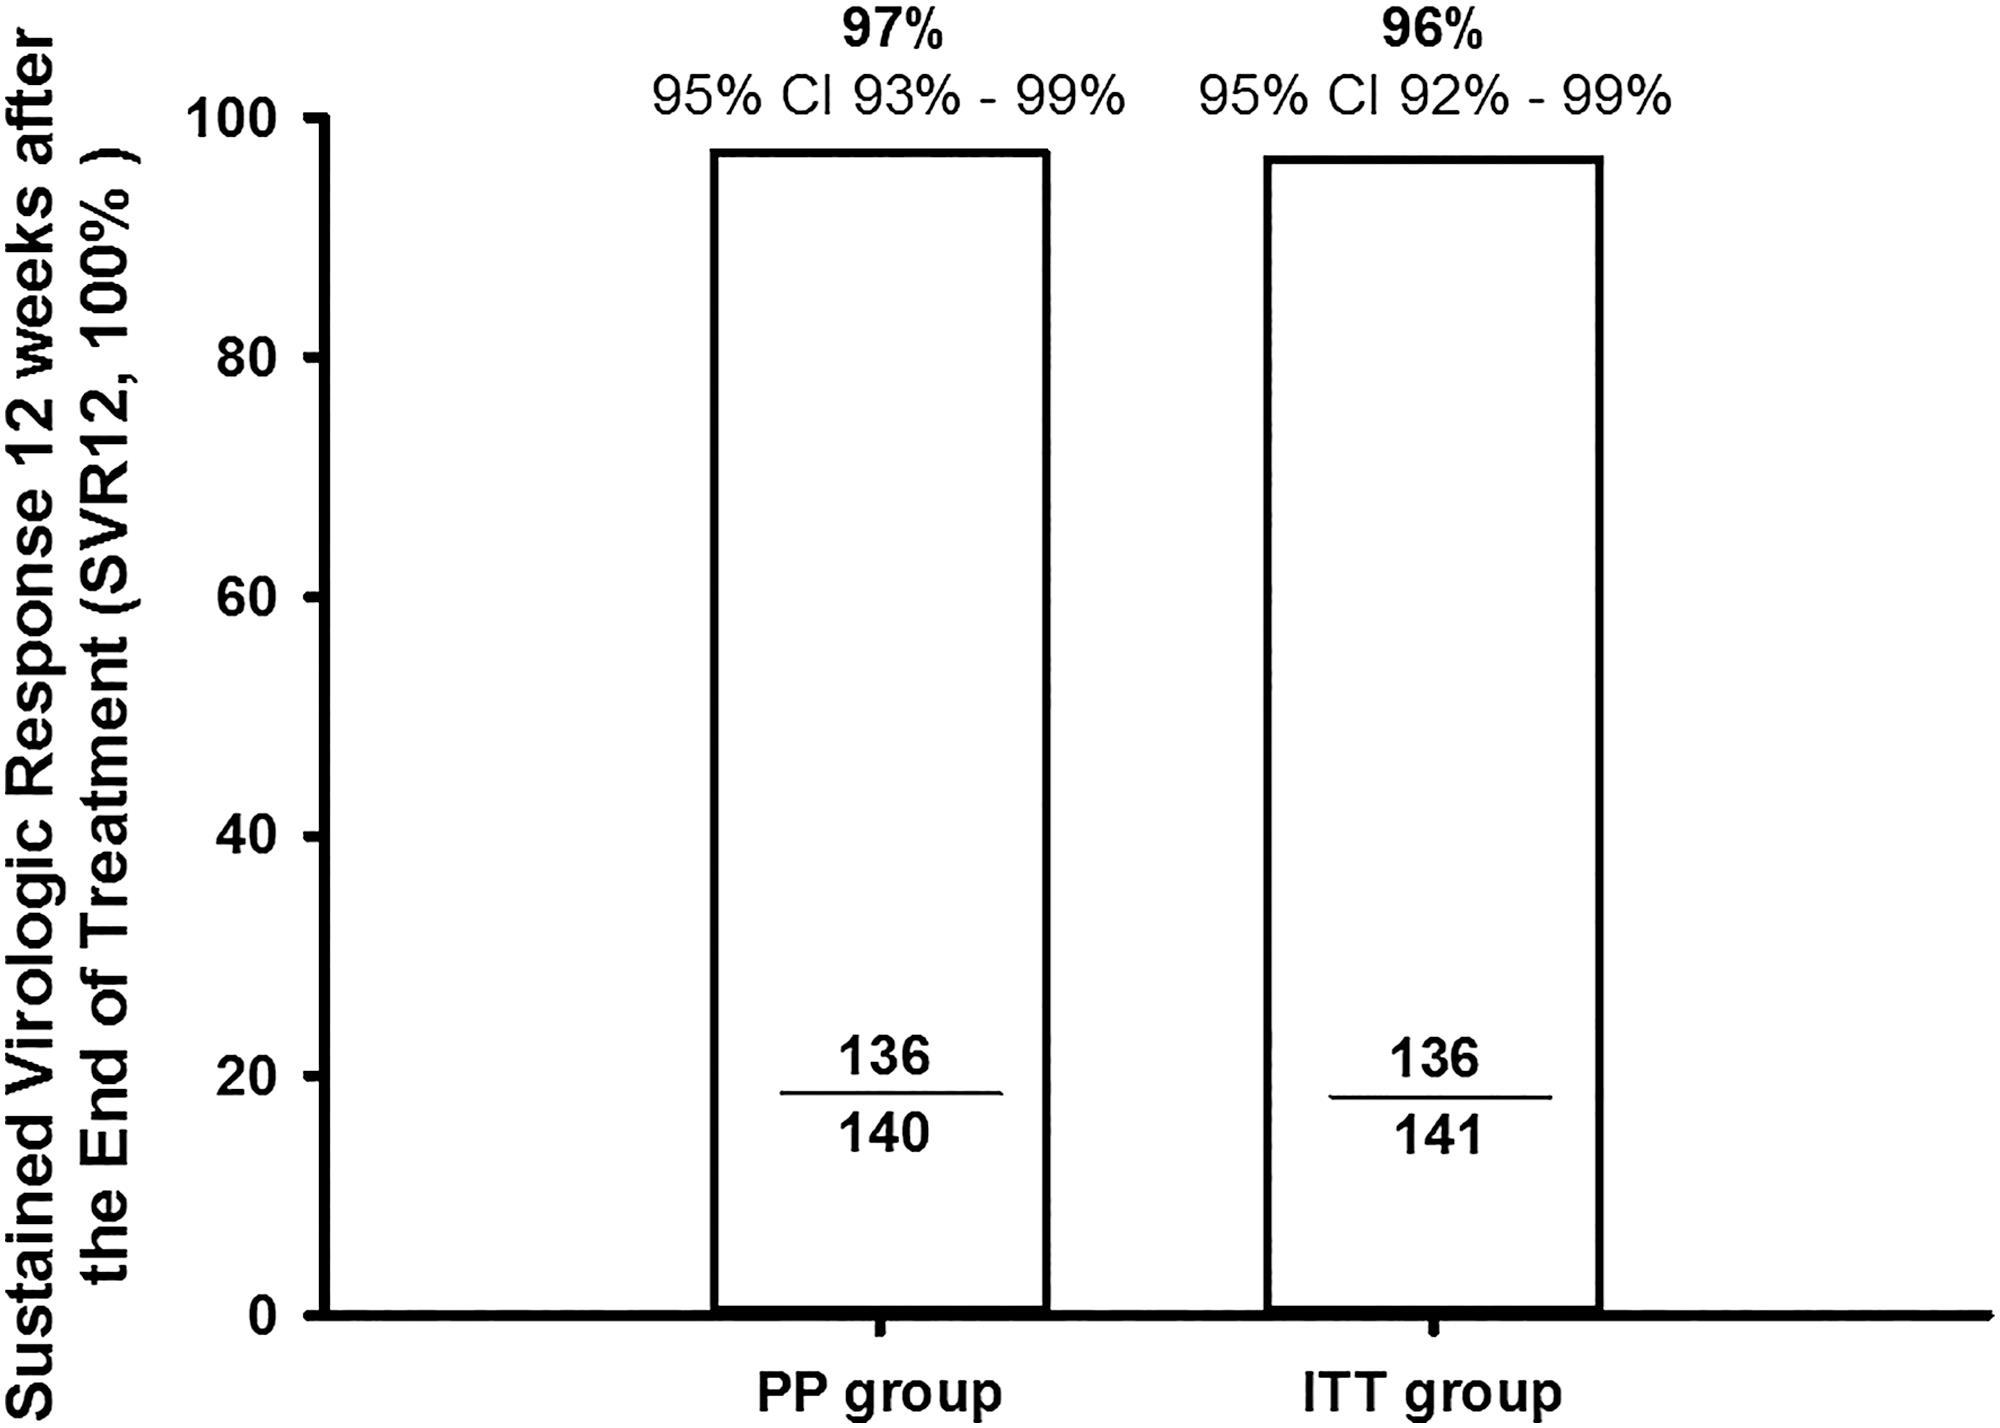 SVR 12 weeks after the end of treatment (SVR12) in PP group (<italic>n</italic> = 140) and ITT group (<italic>n</italic> = 141).